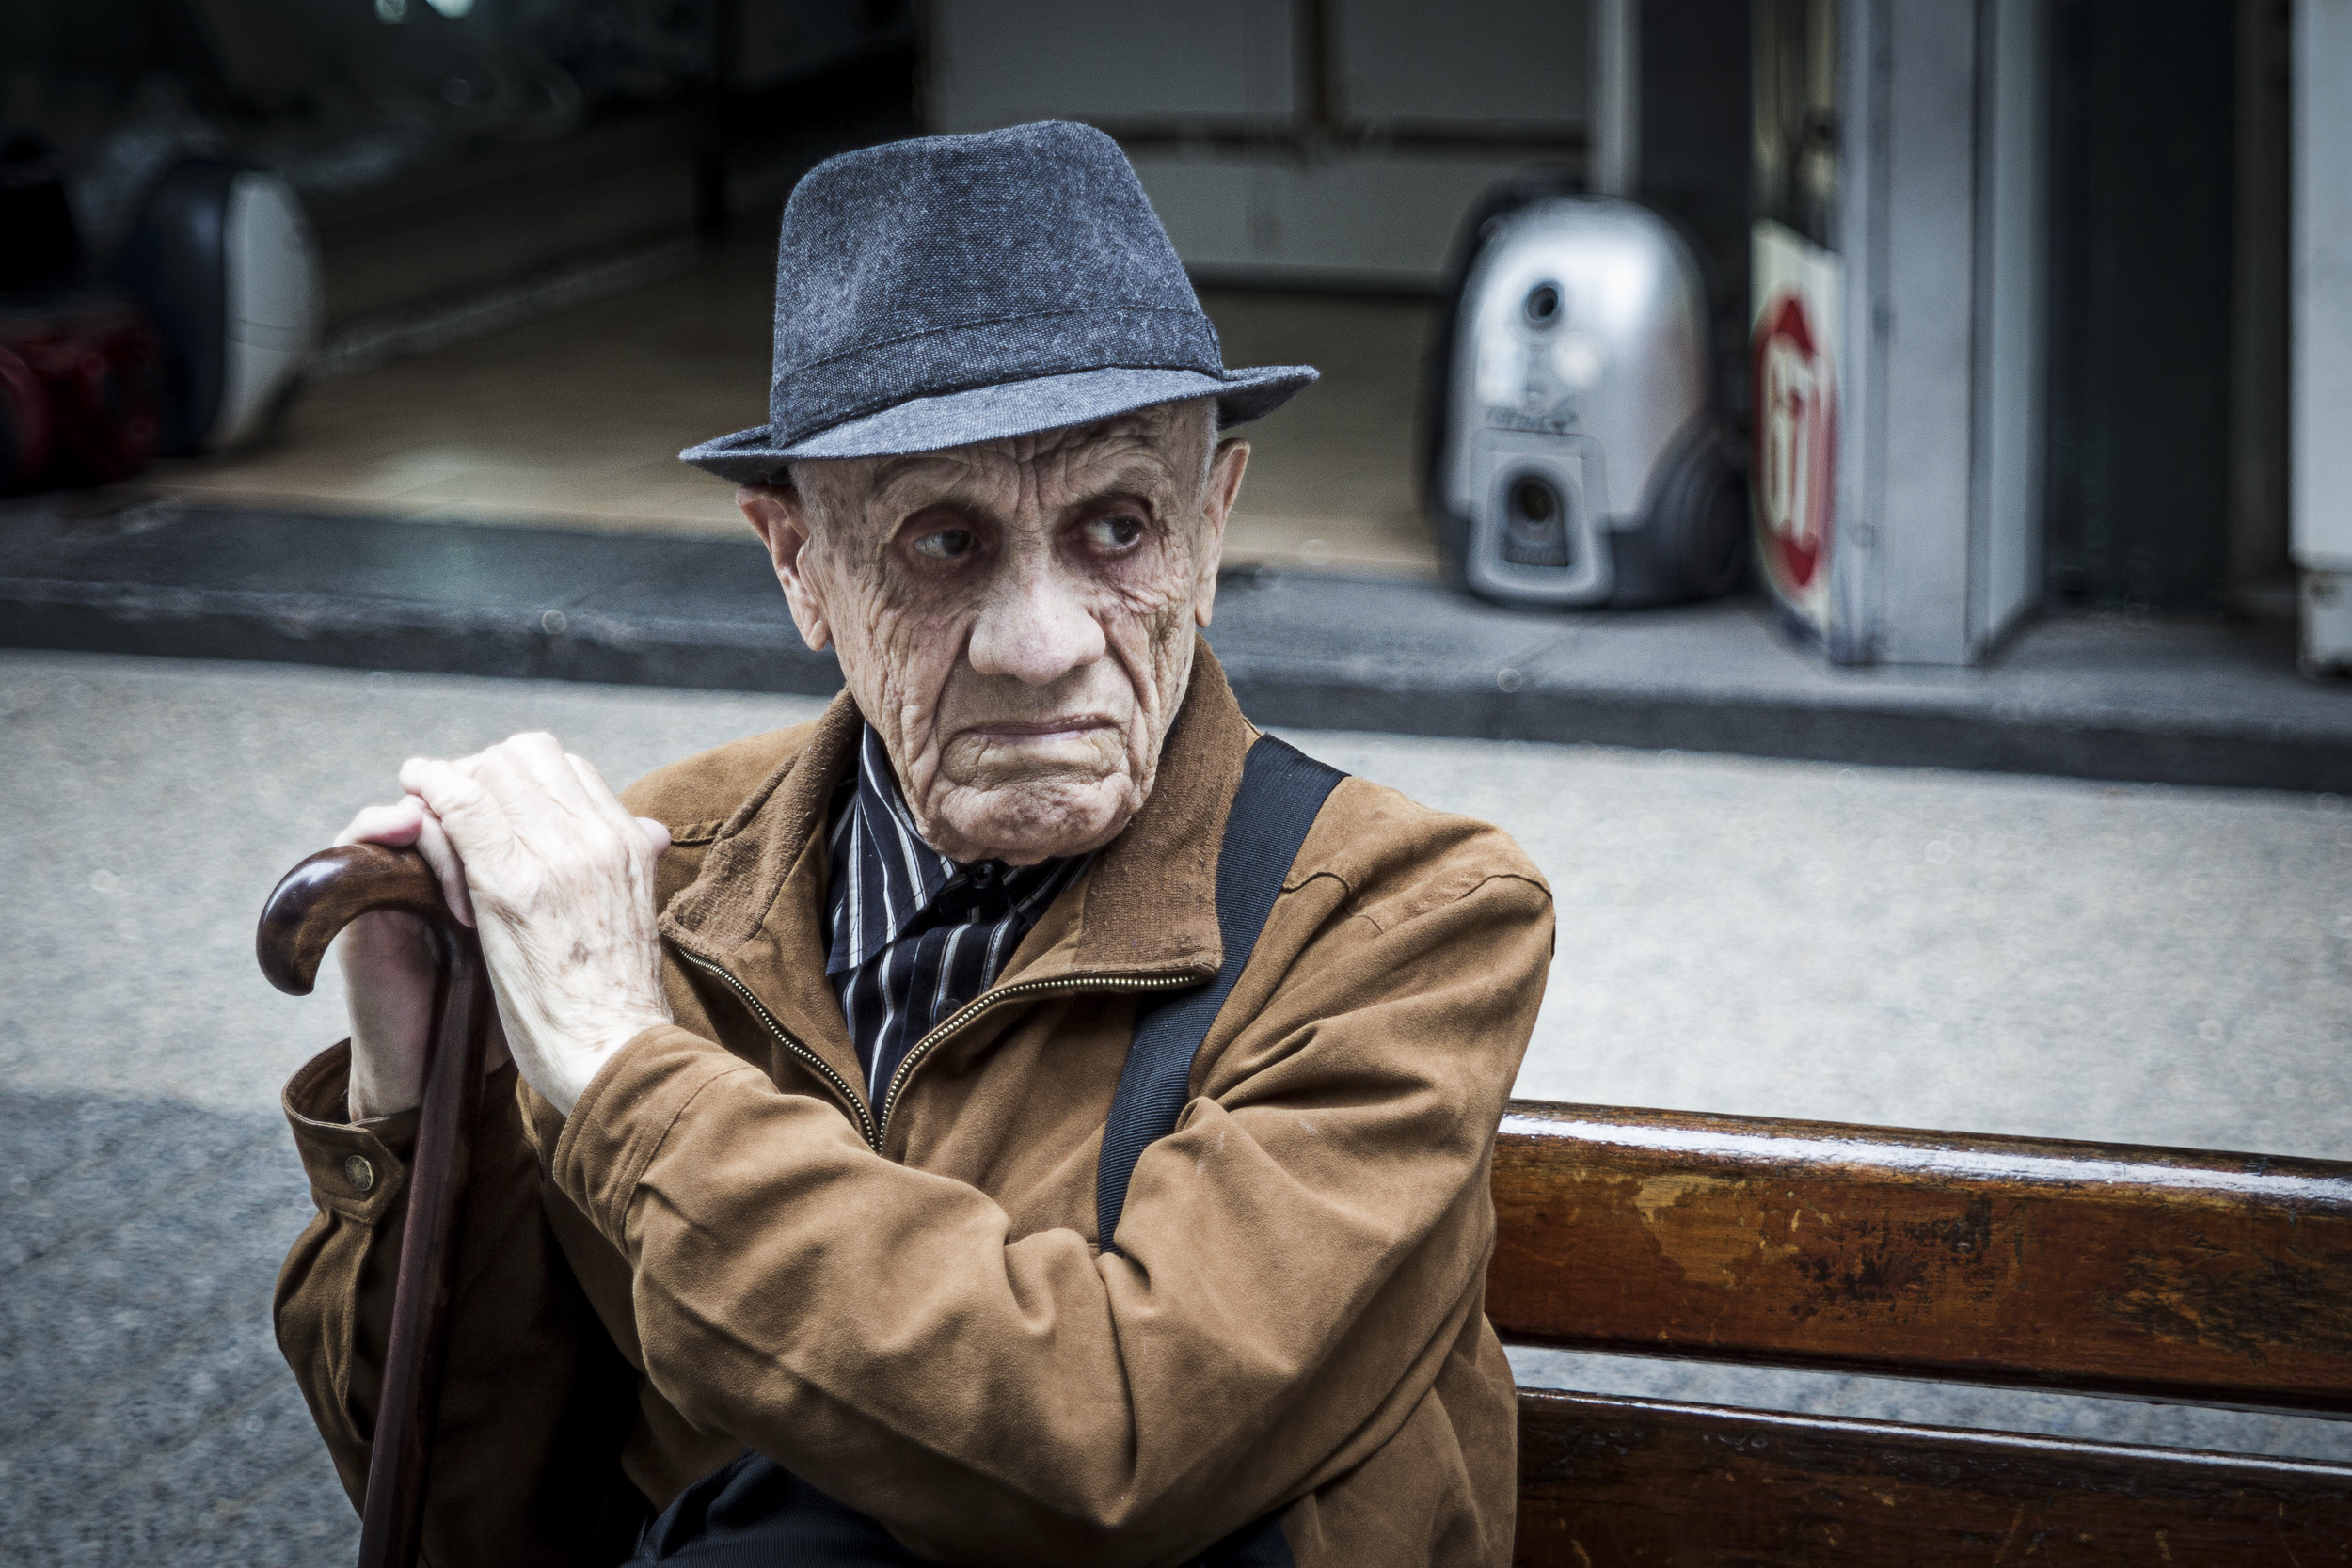 older gentleman on bench (4 of 4).jpg